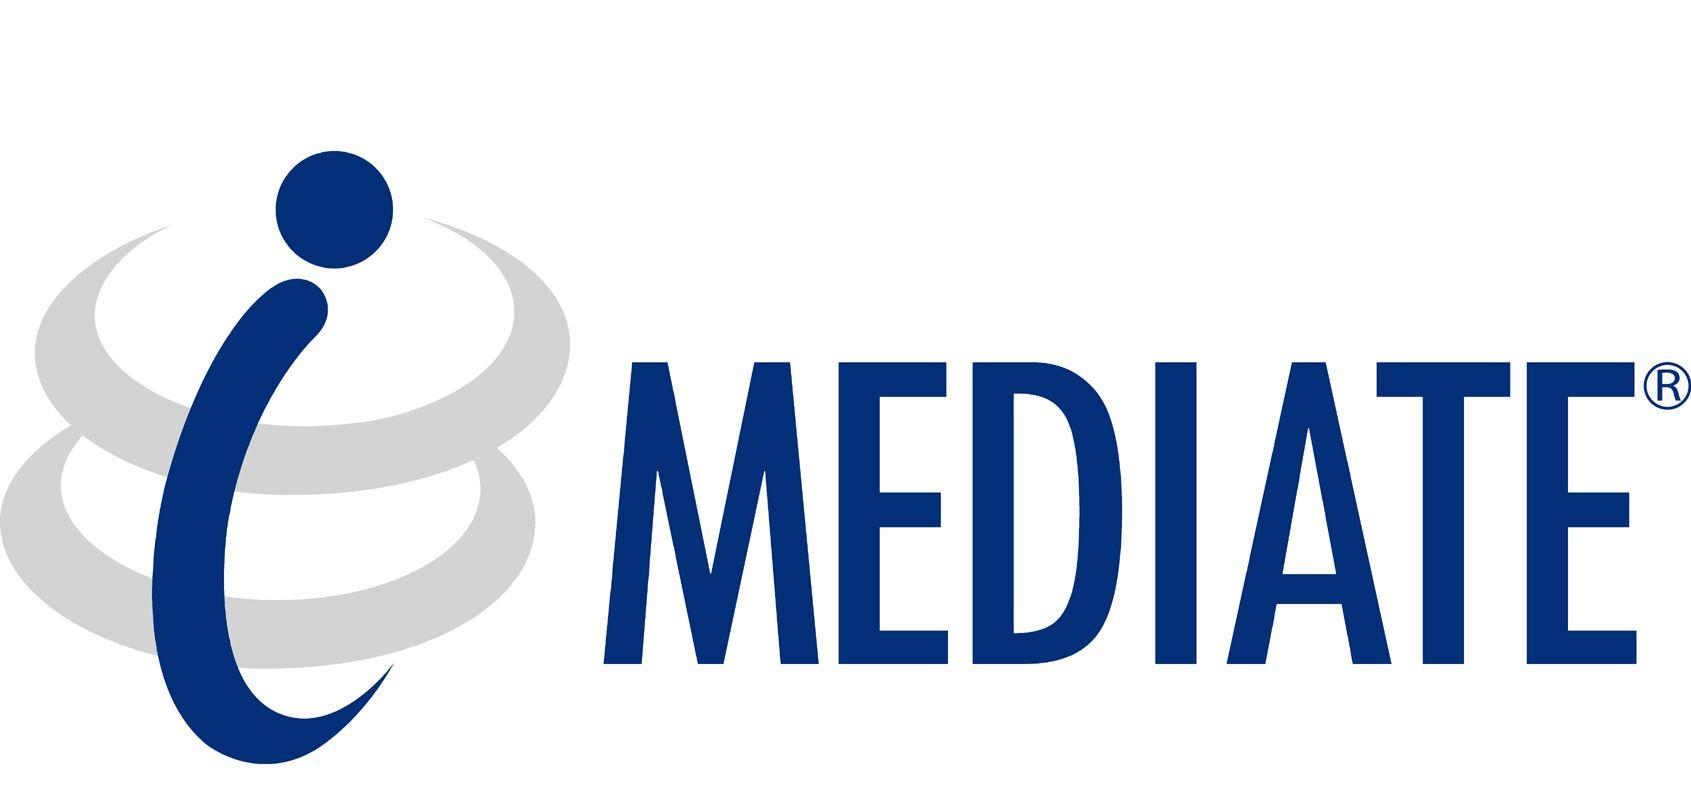 Family Mediation Florida - iMediate Inc. www.ichatmediation.com/3Reasons/